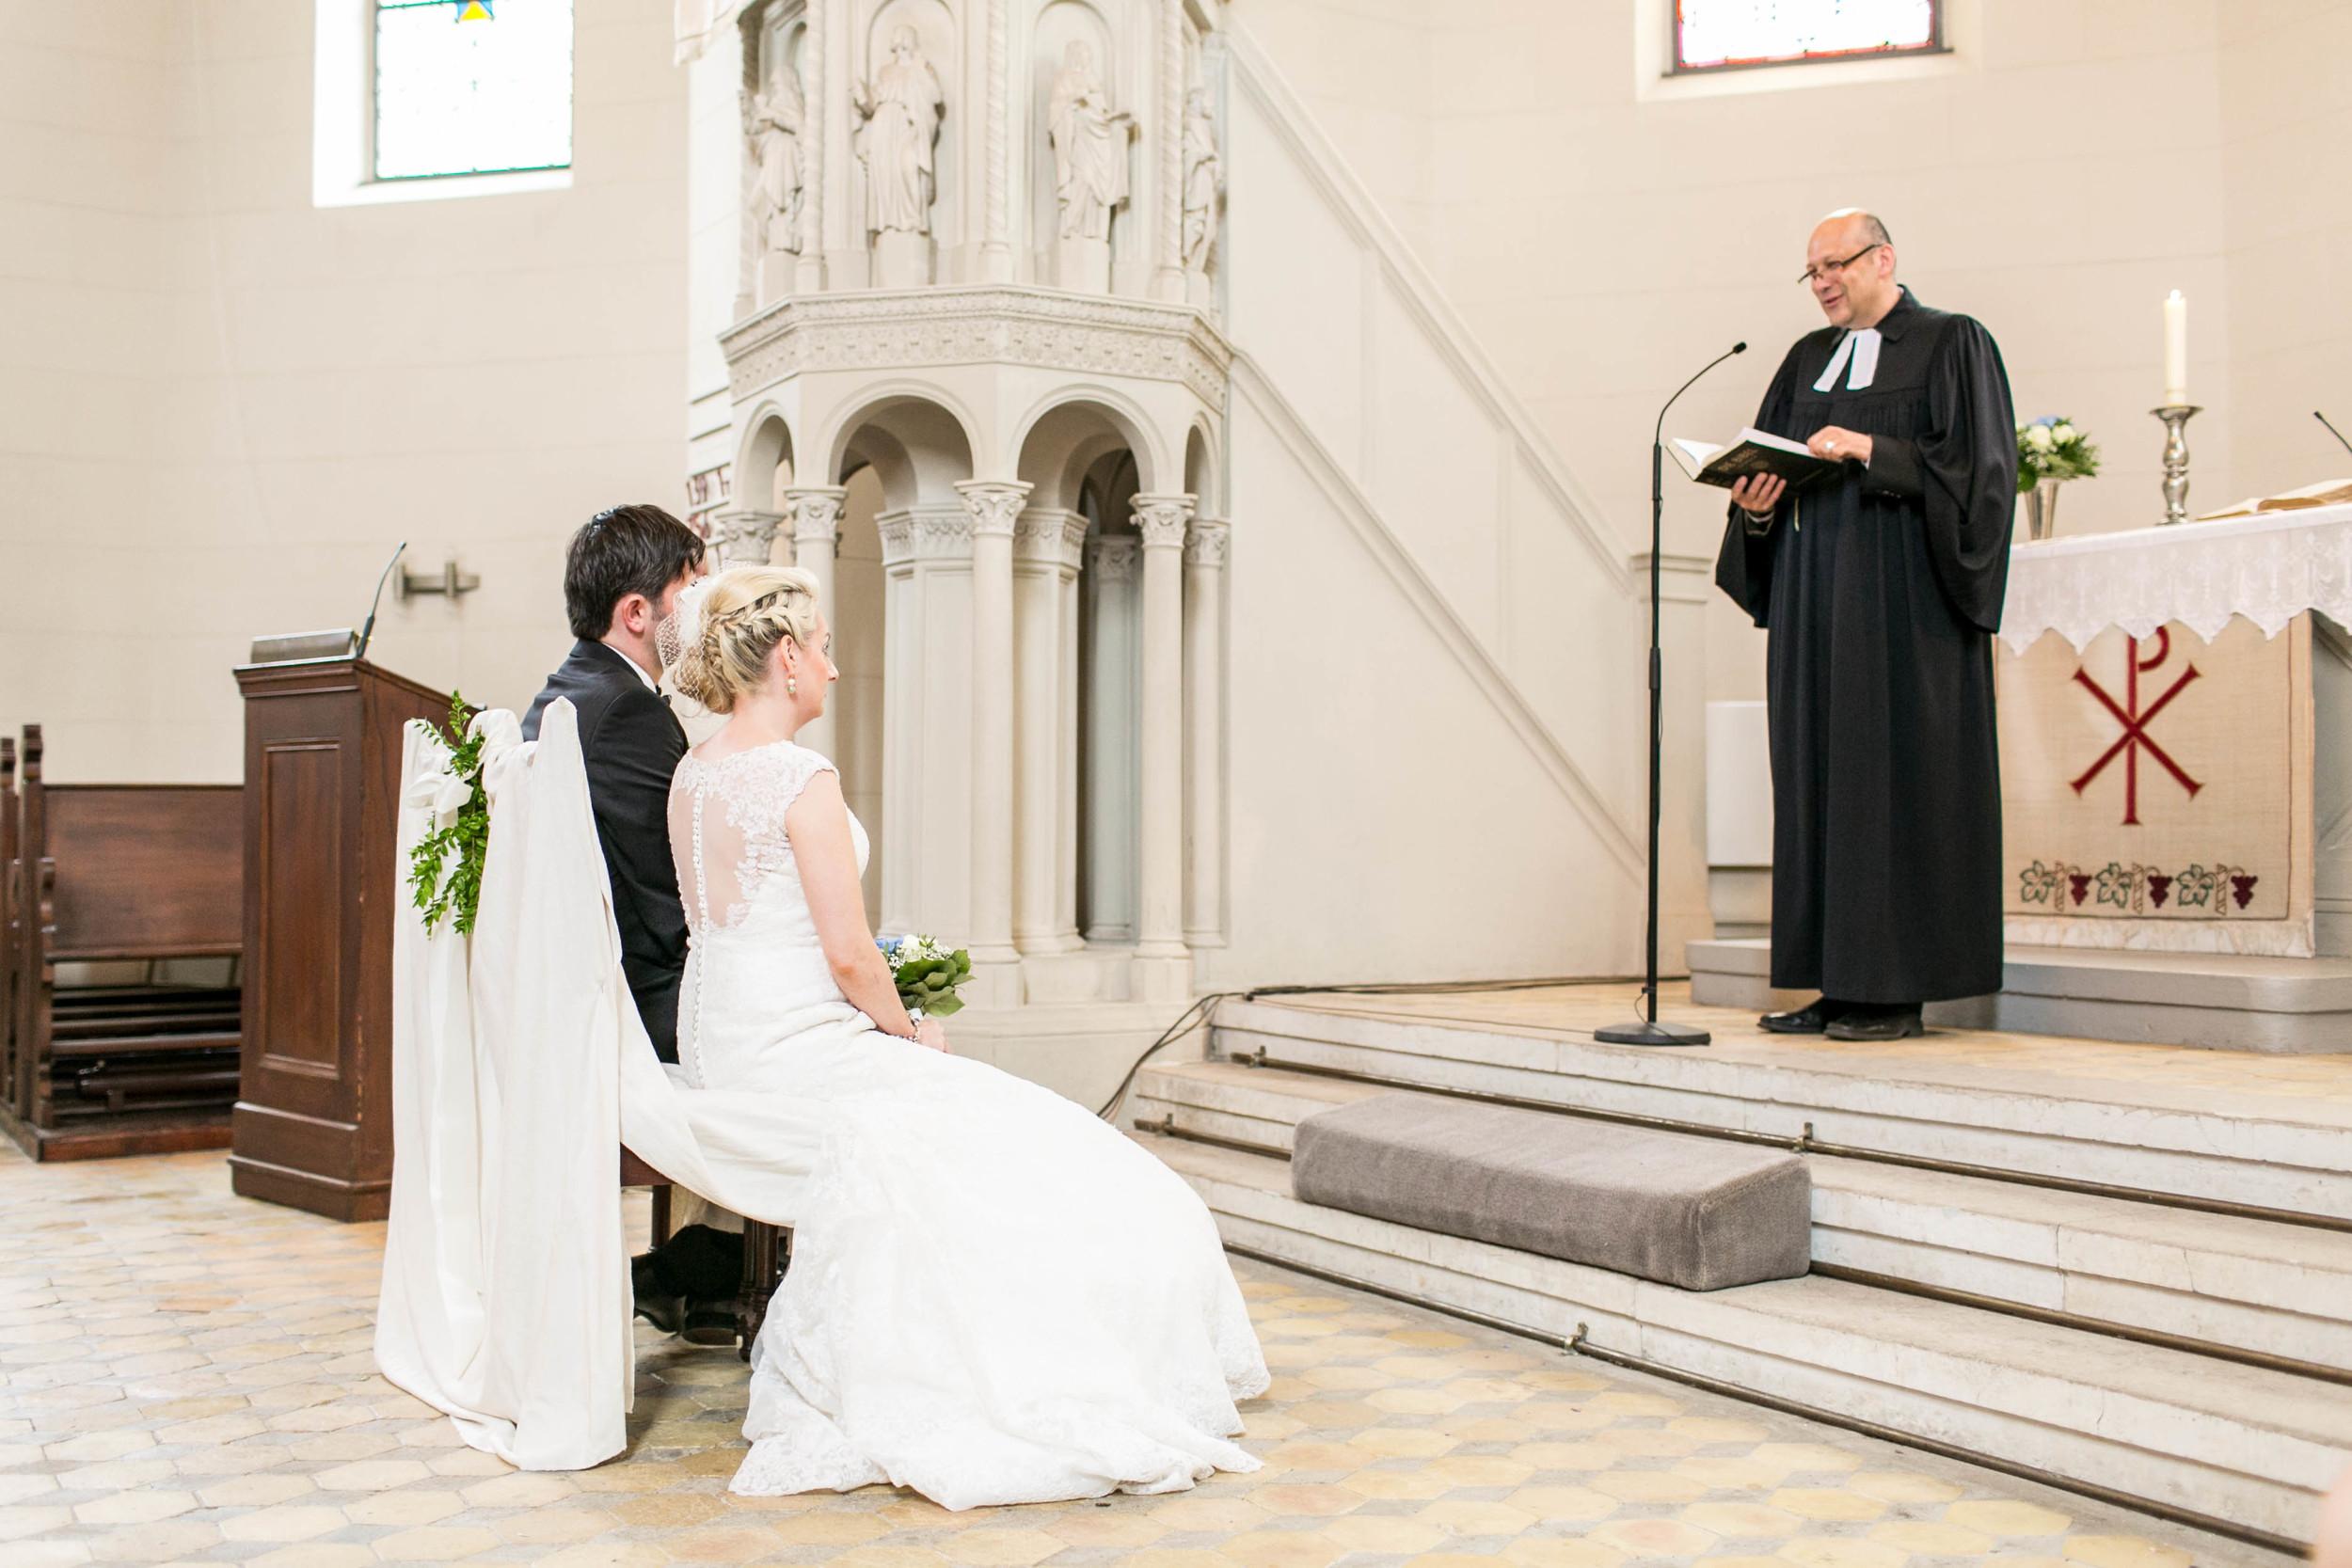 Hochzeitsfotografie Berlin_Fran Burrows Fotografie_14.jpg